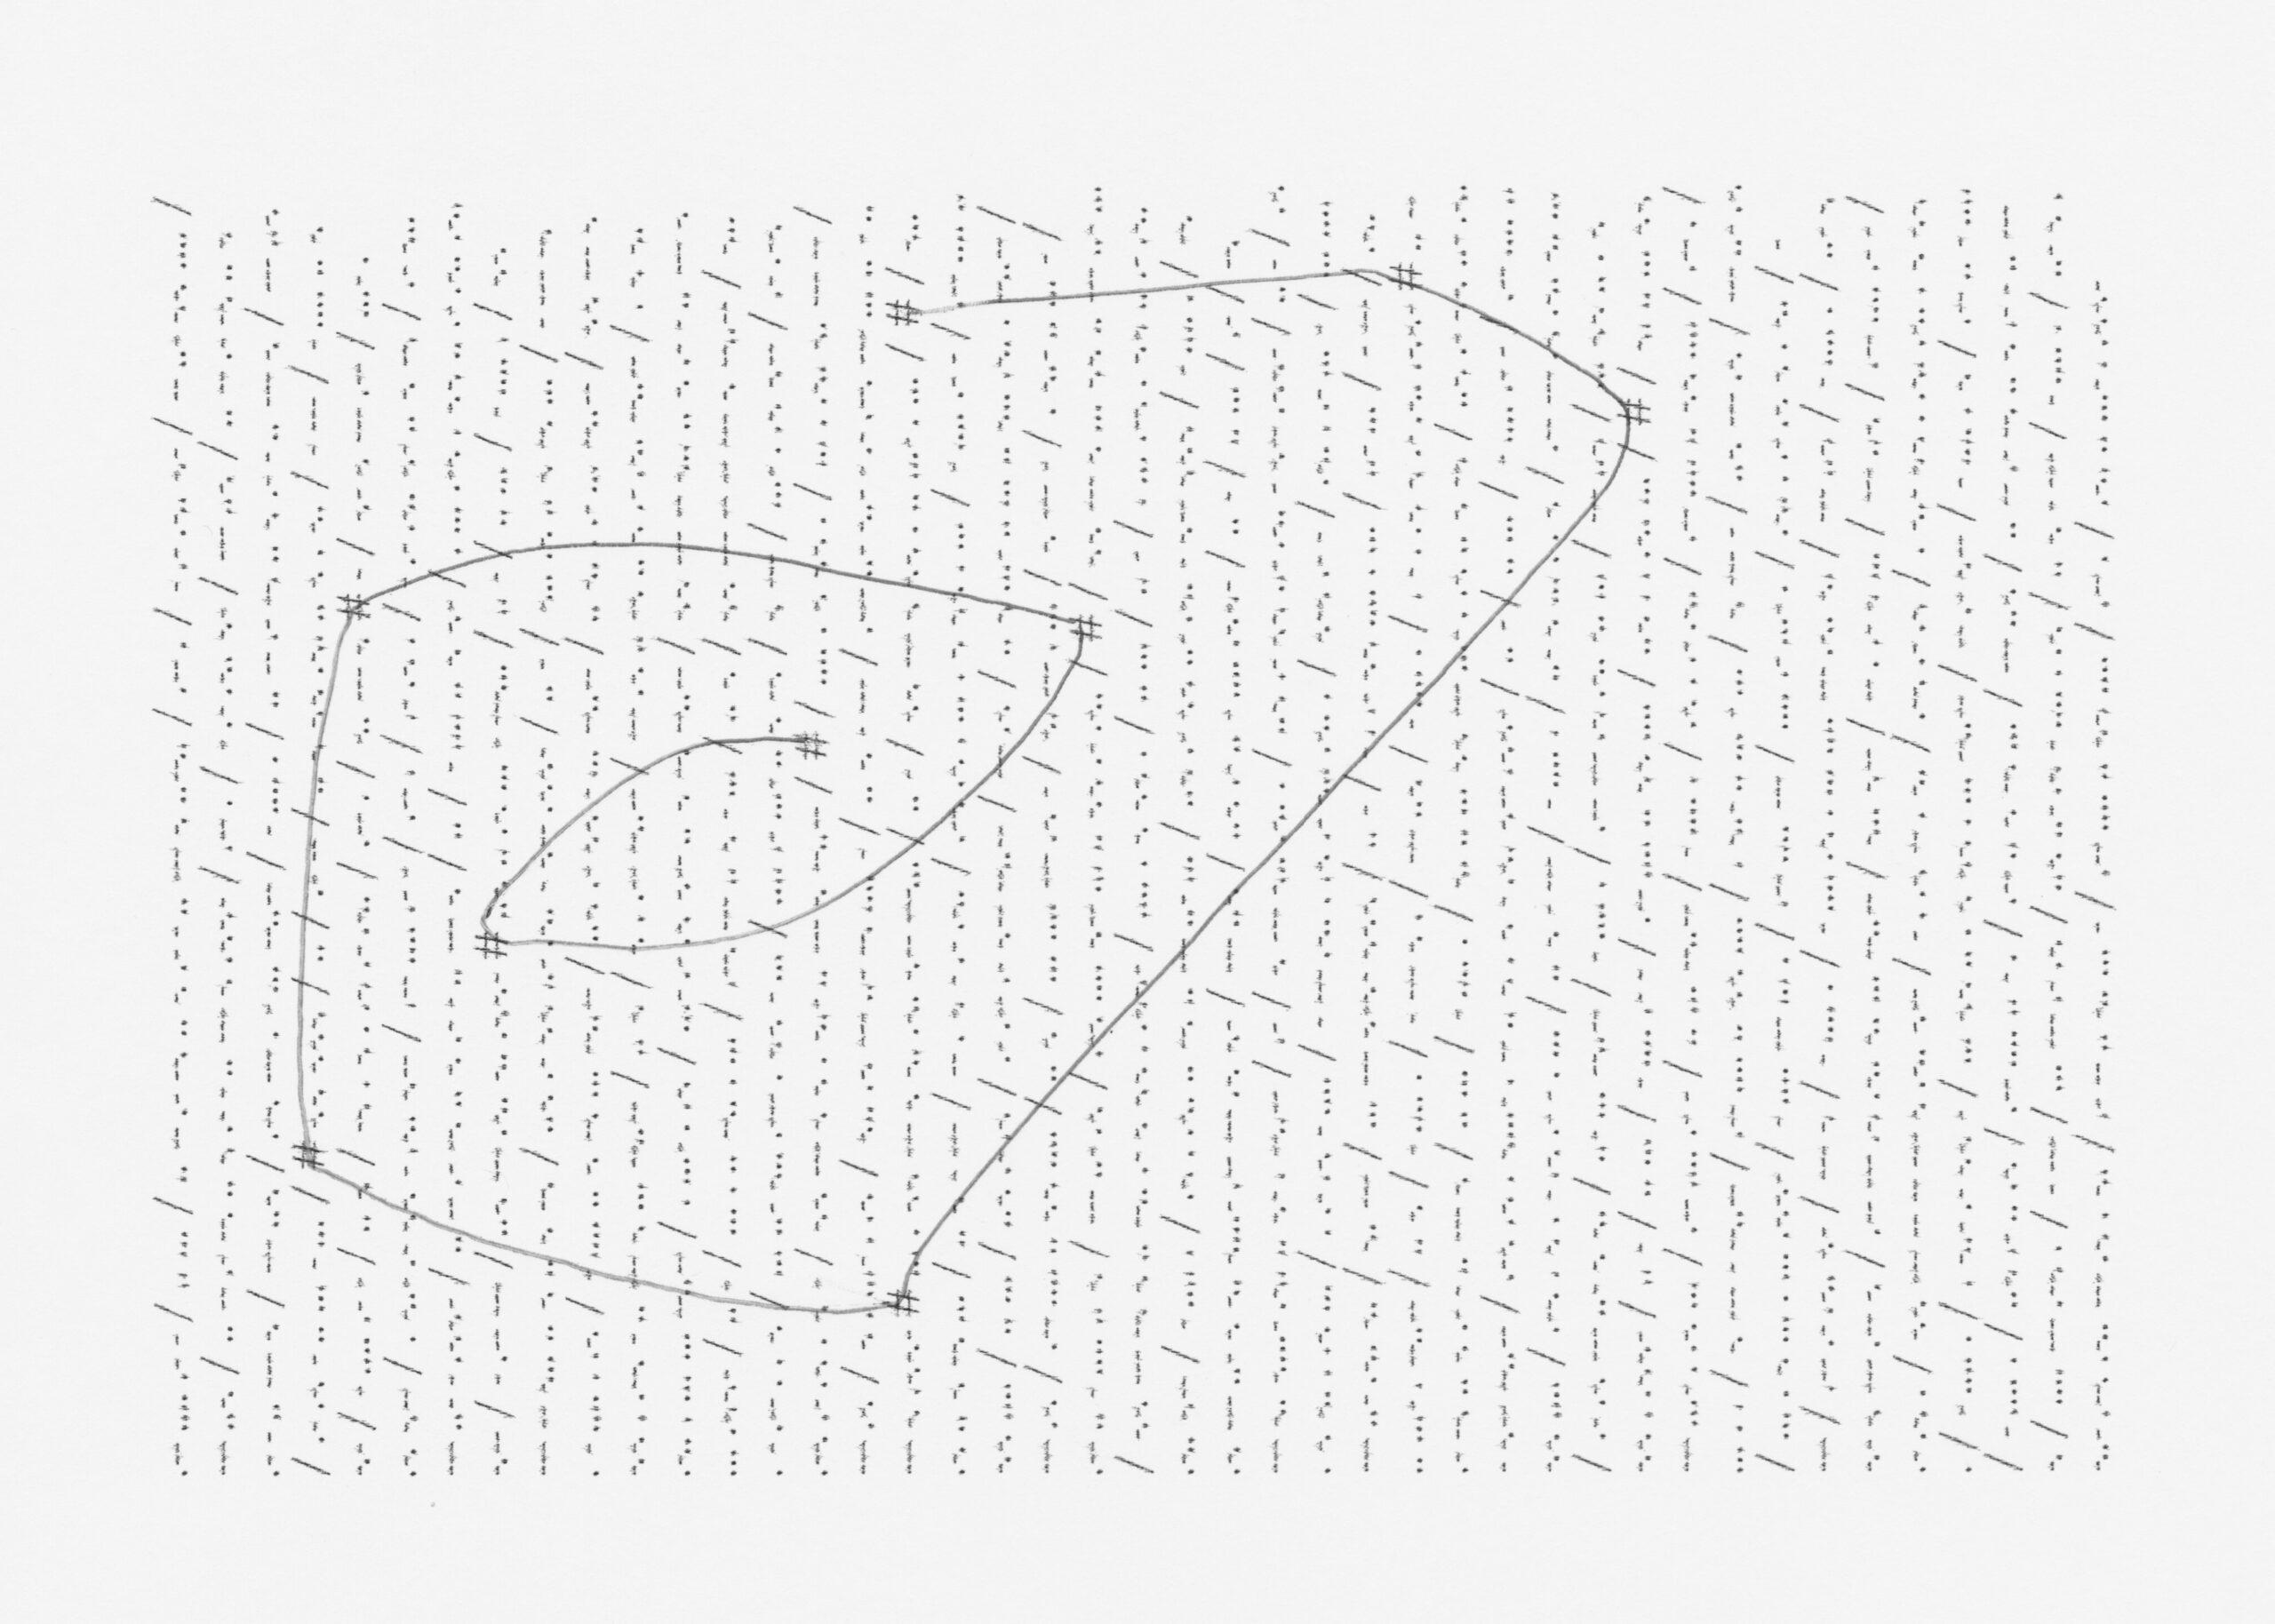 A_2020_04_23_scans_total_morseknittingScan